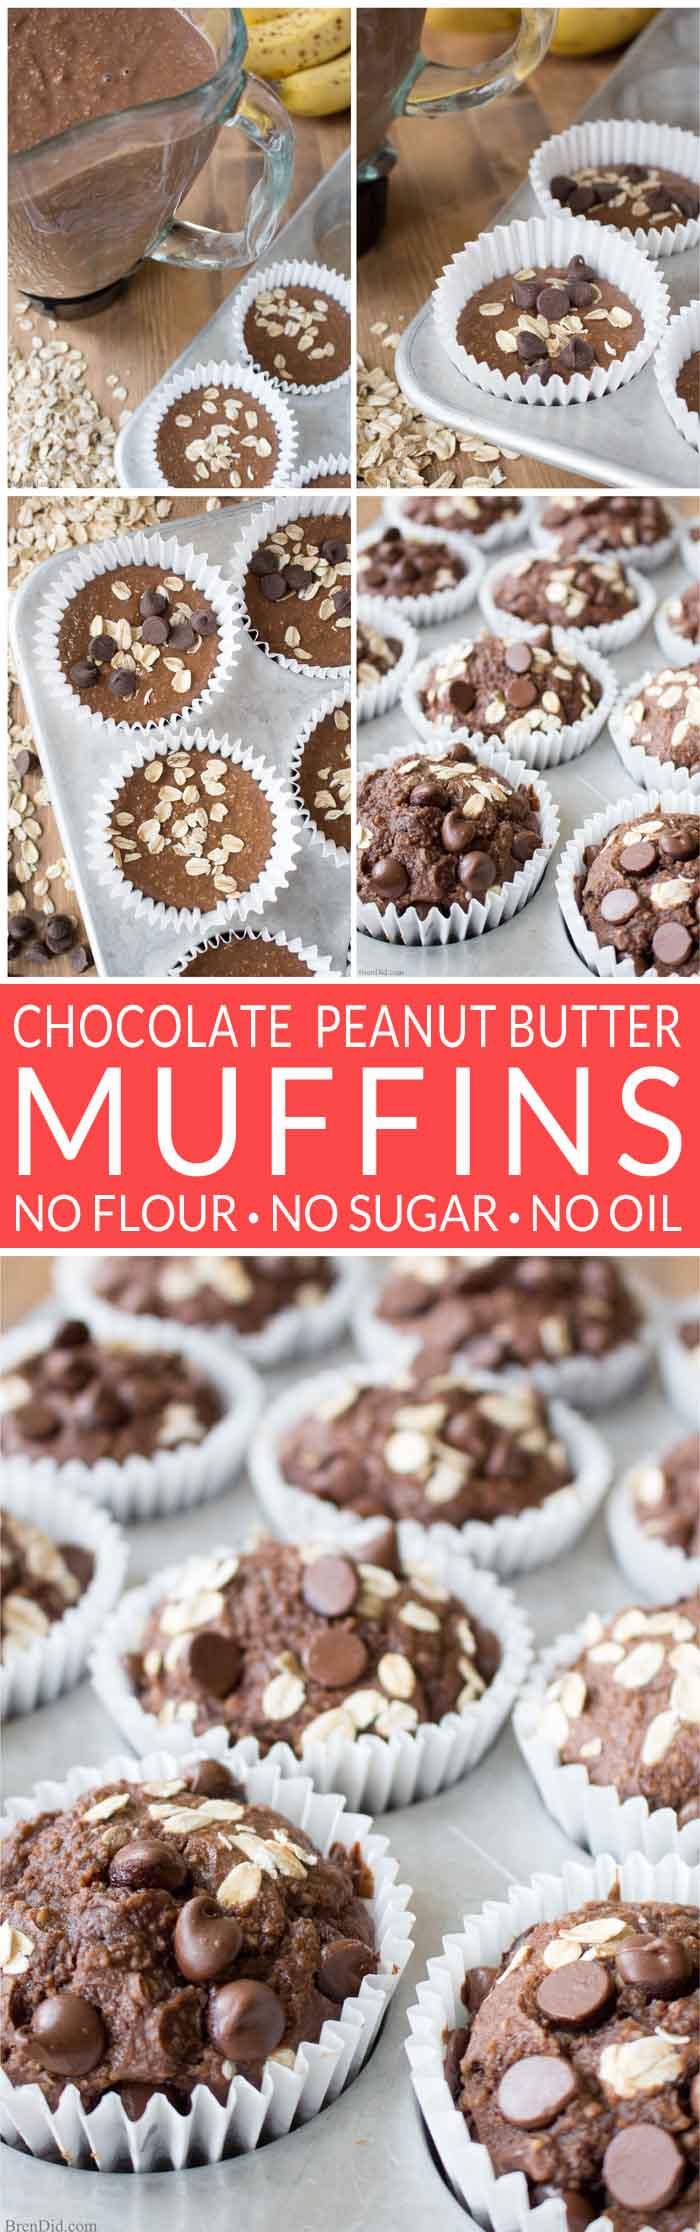 Healthy Muffins | Chocolate Peanut Butter Muffins | Blender Muffins | Chocolate pb flavor with NO flour NO sugar & NO oil